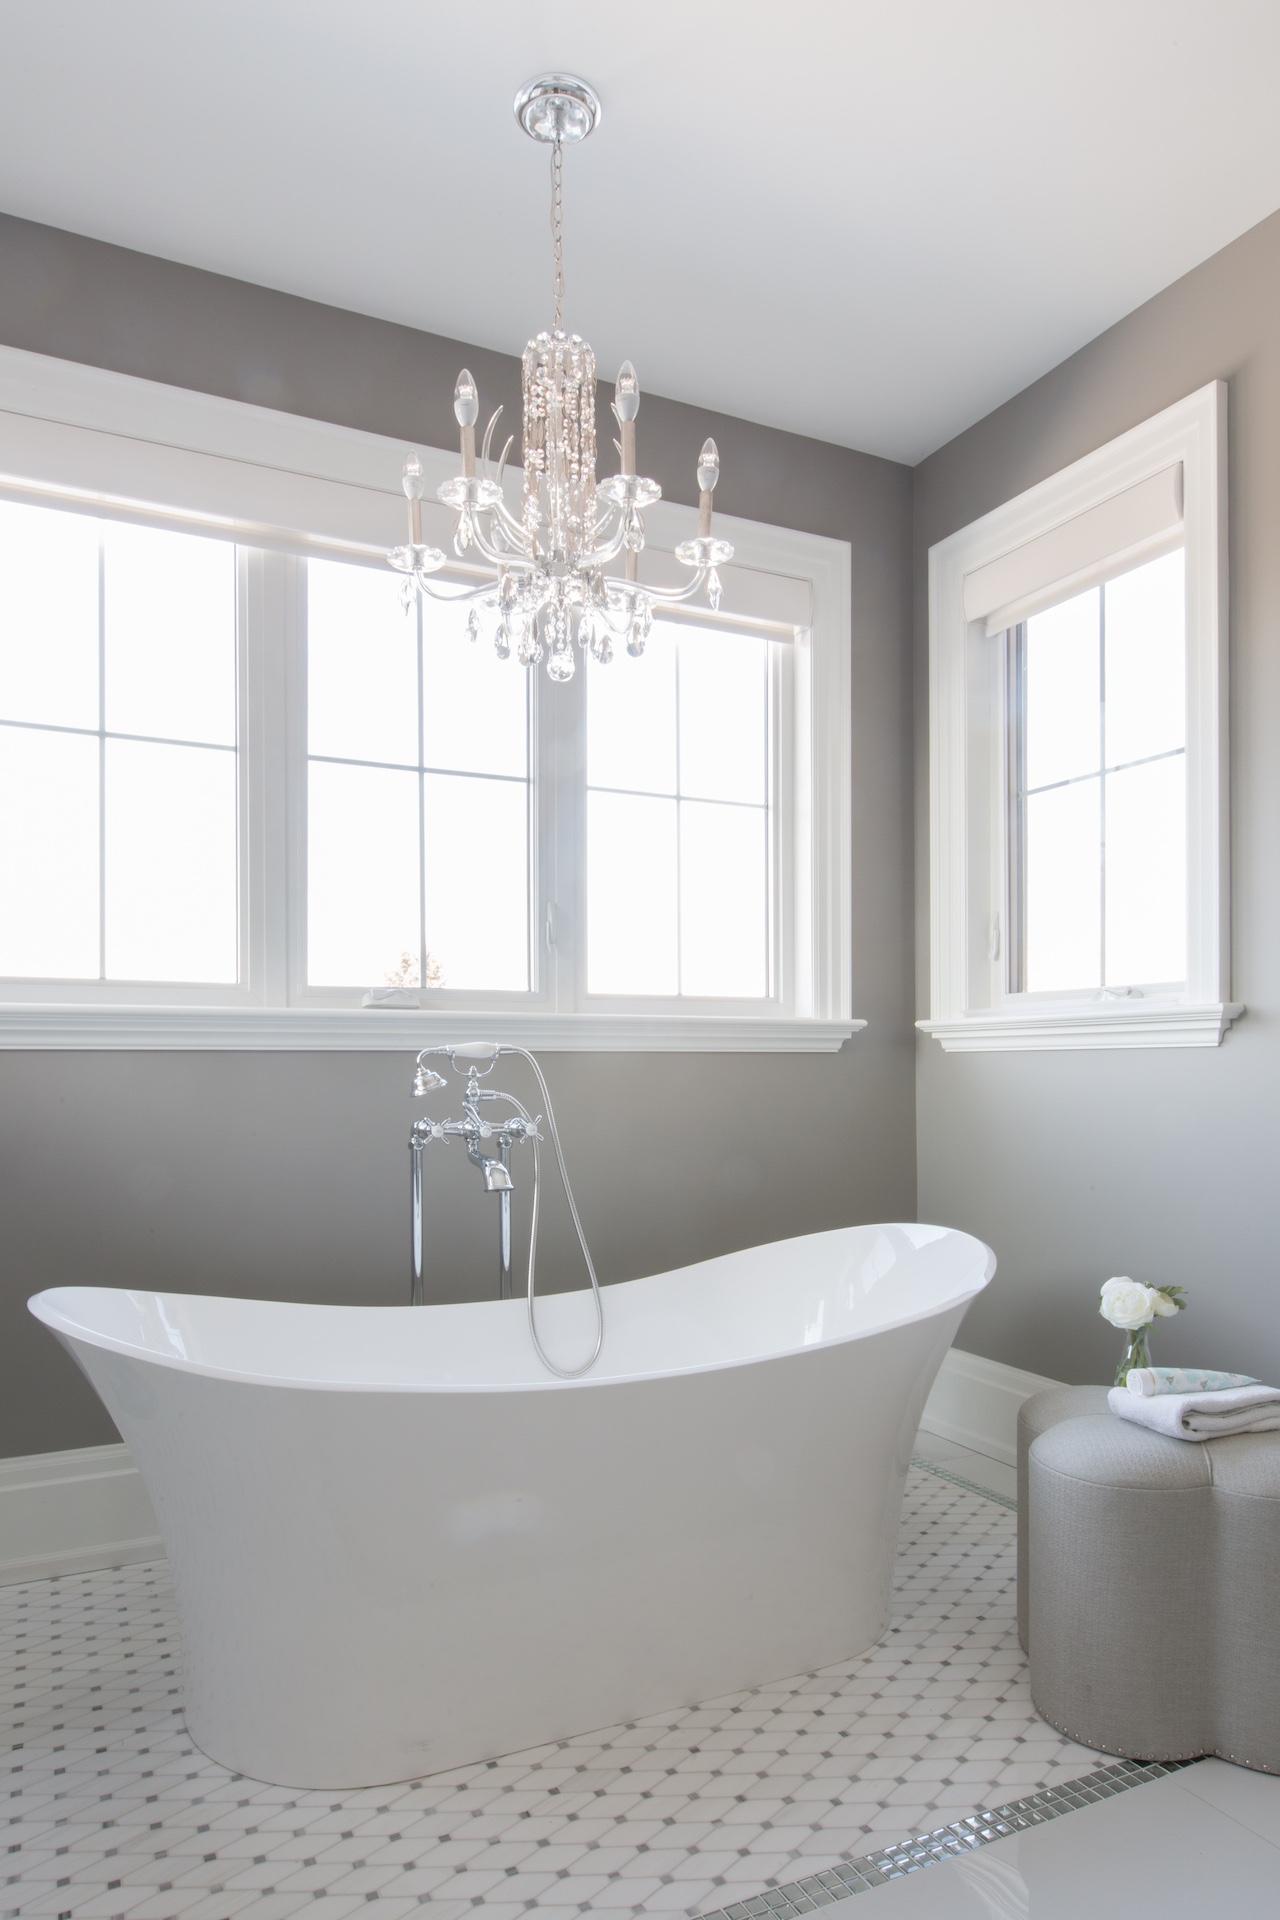 white tub under light with windows